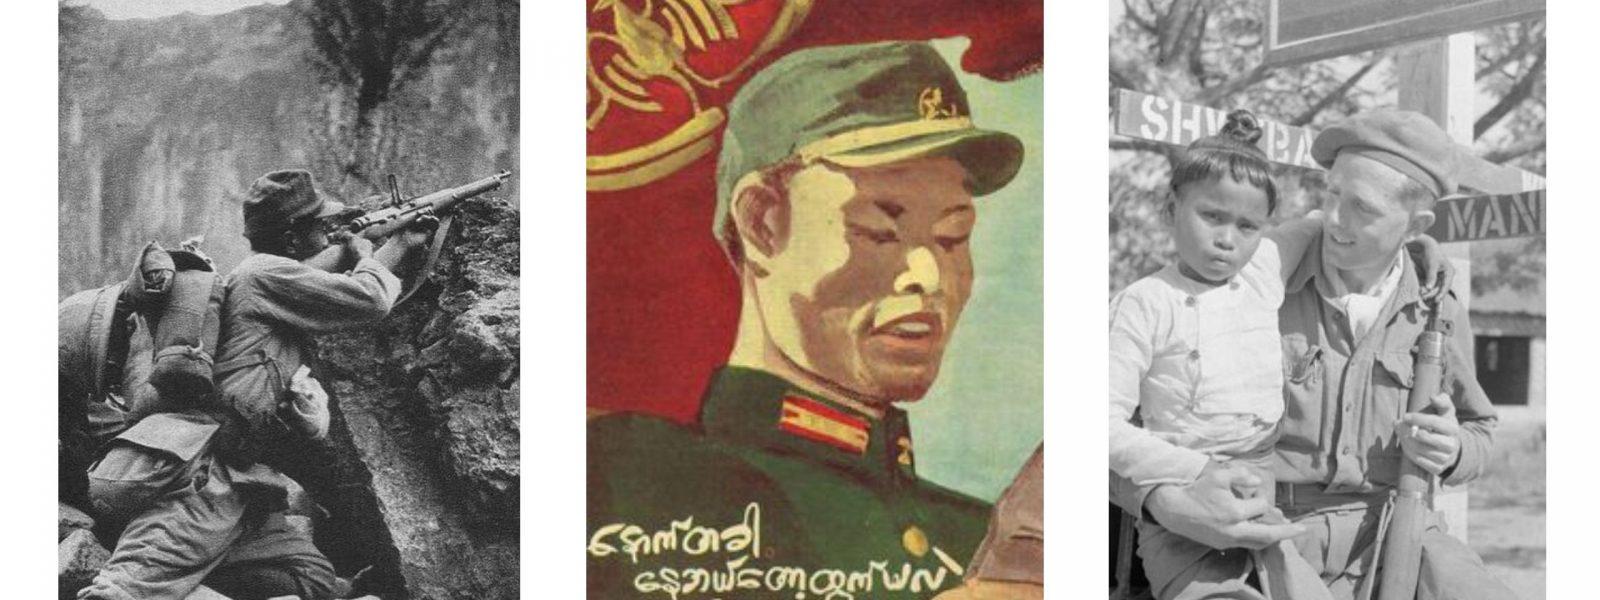 History - collage of WW2 Burm Campaign - Sampan Travel